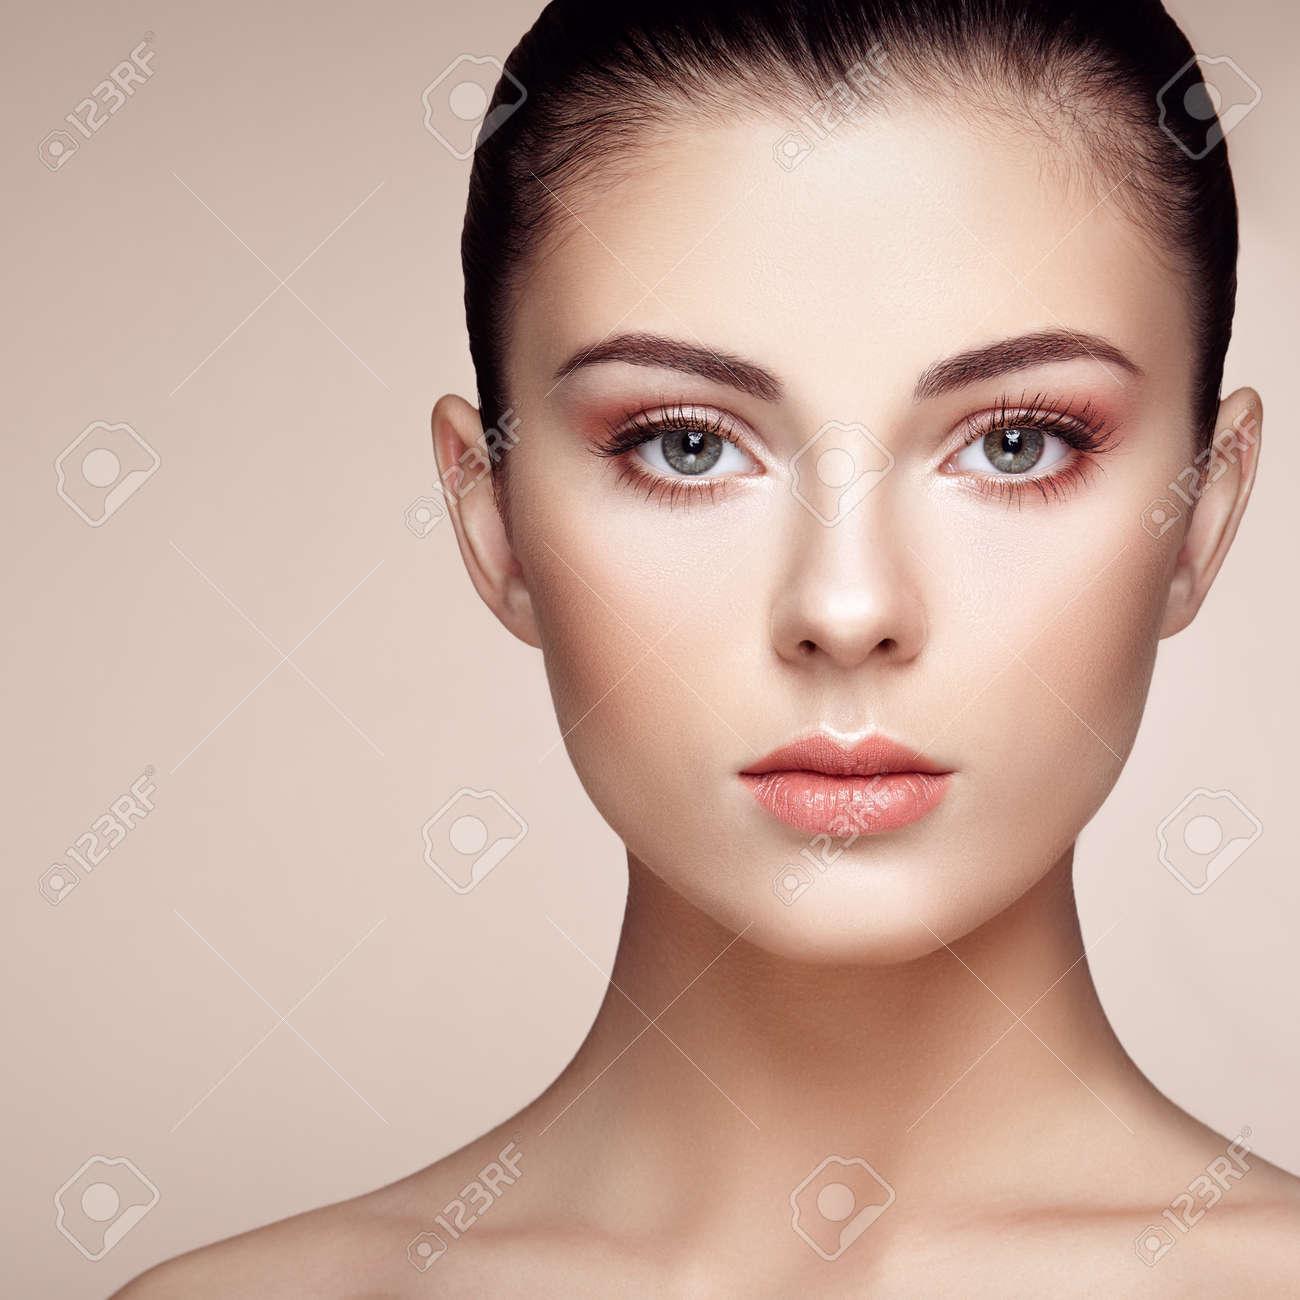 Beautiful woman face. Perfect makeup. Beauty fashion. Eyelashes. Cosmetic Eyeshadow. Highlighting - 54978500